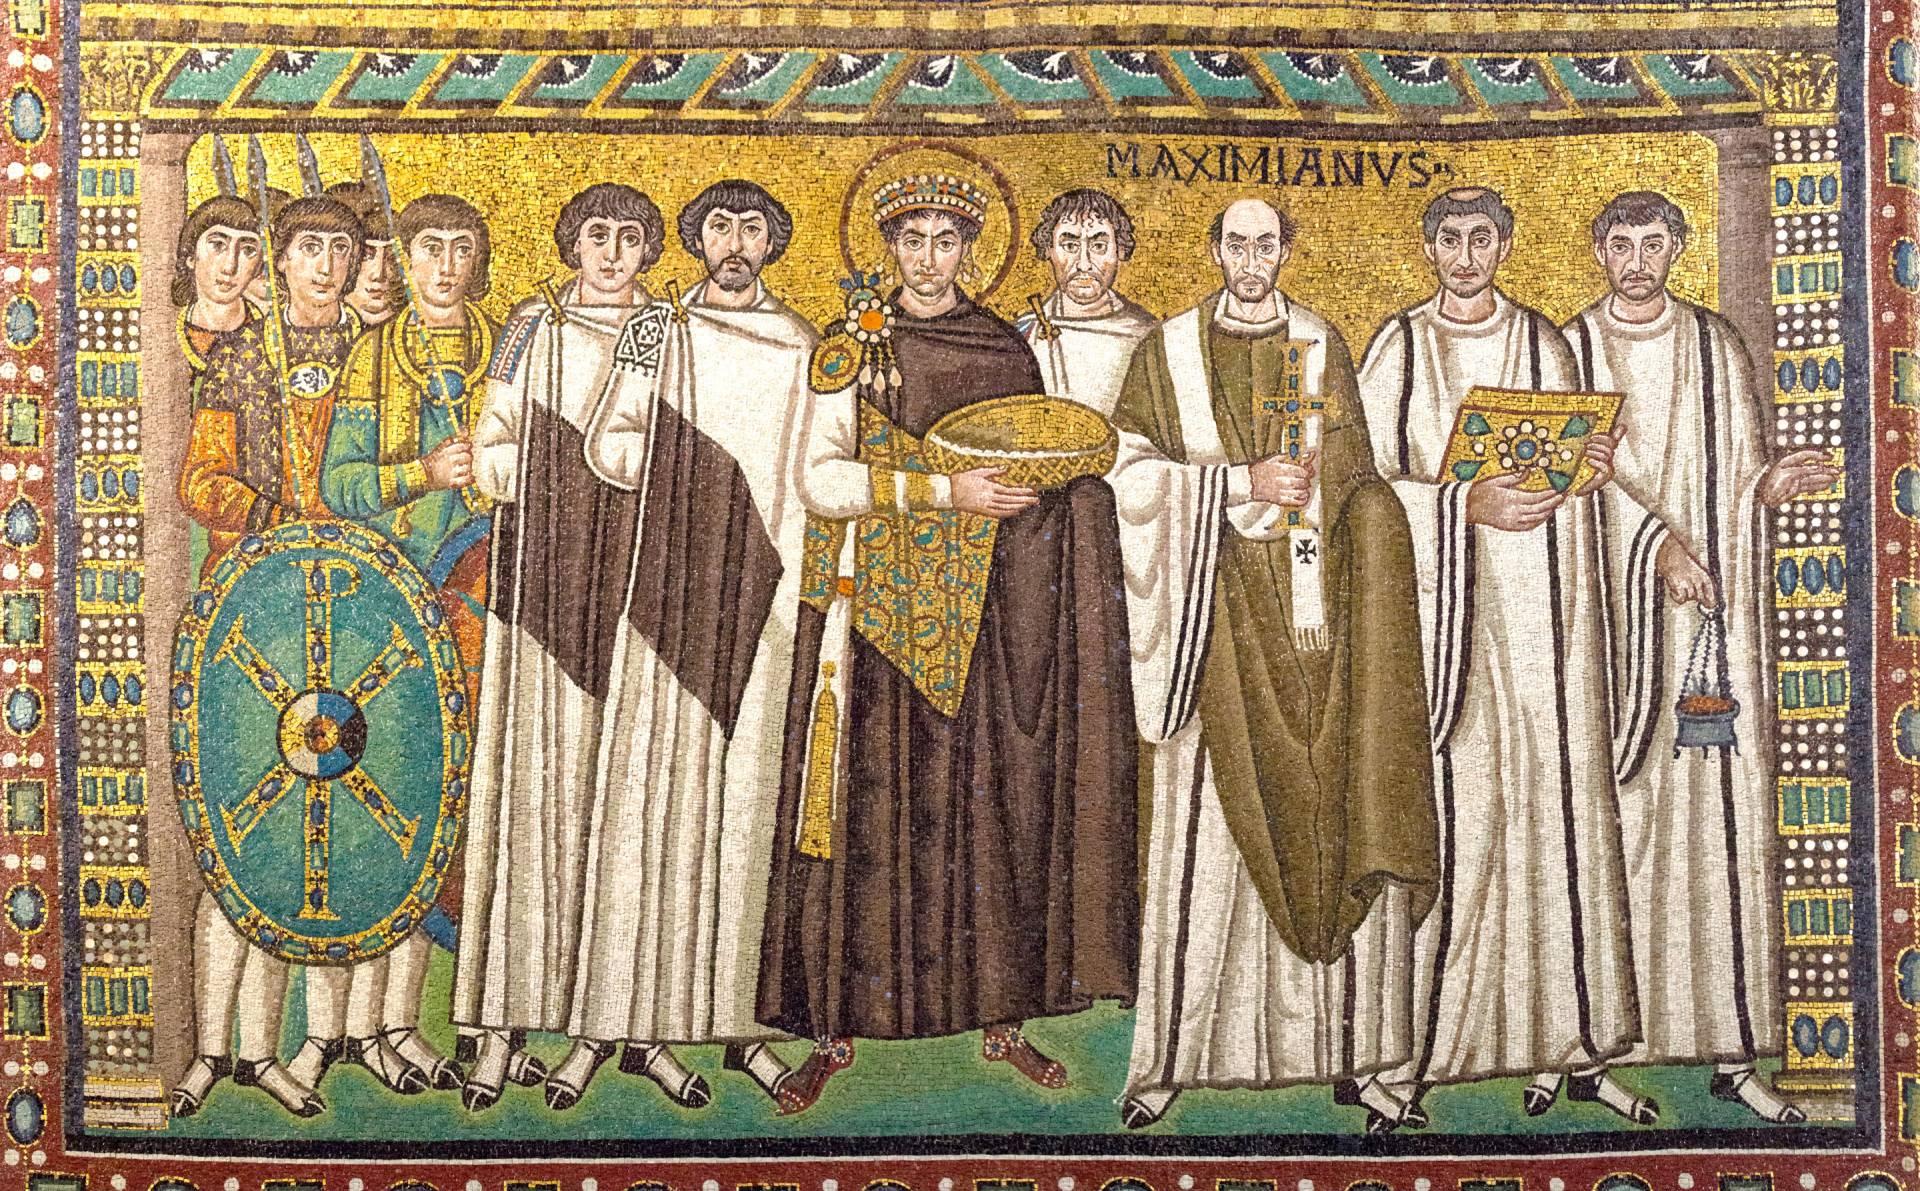 Mosaic in the Basilica of San Vitale